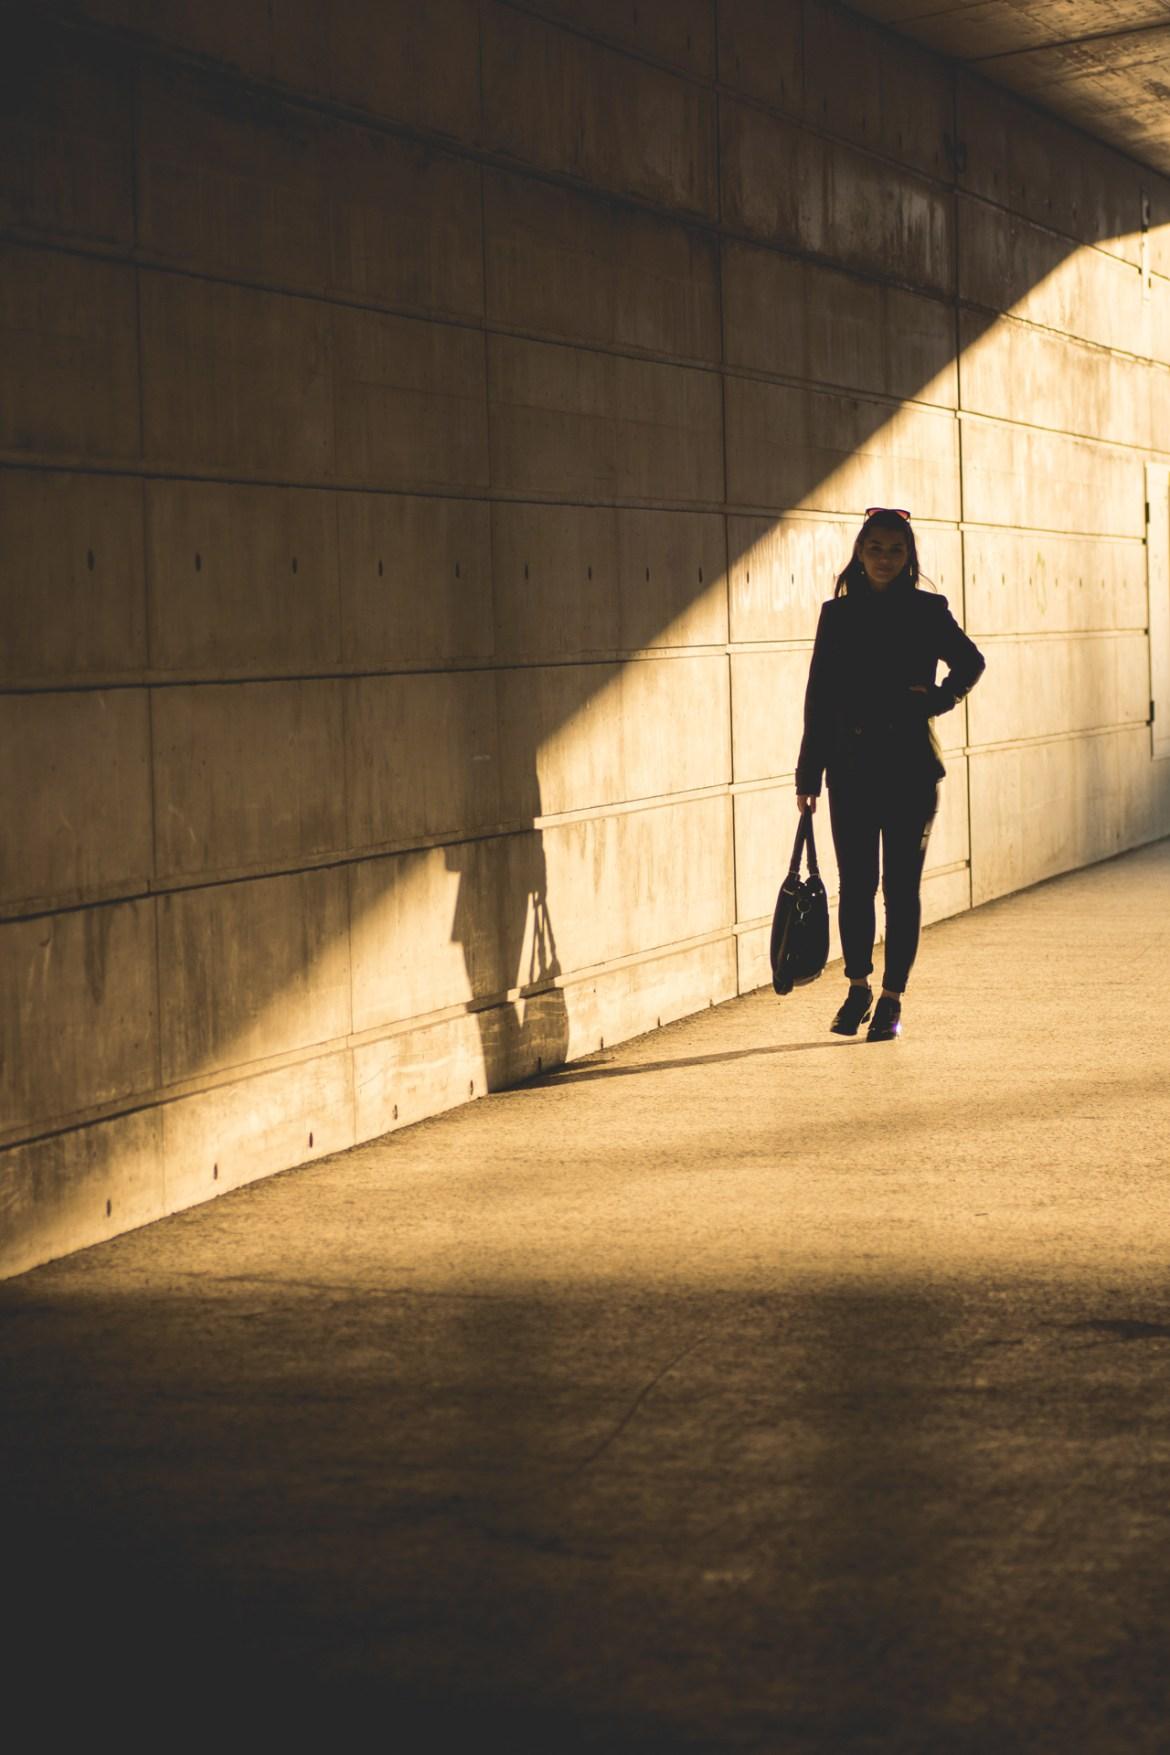 Schwarze Frauensillouette im Lichtkegel